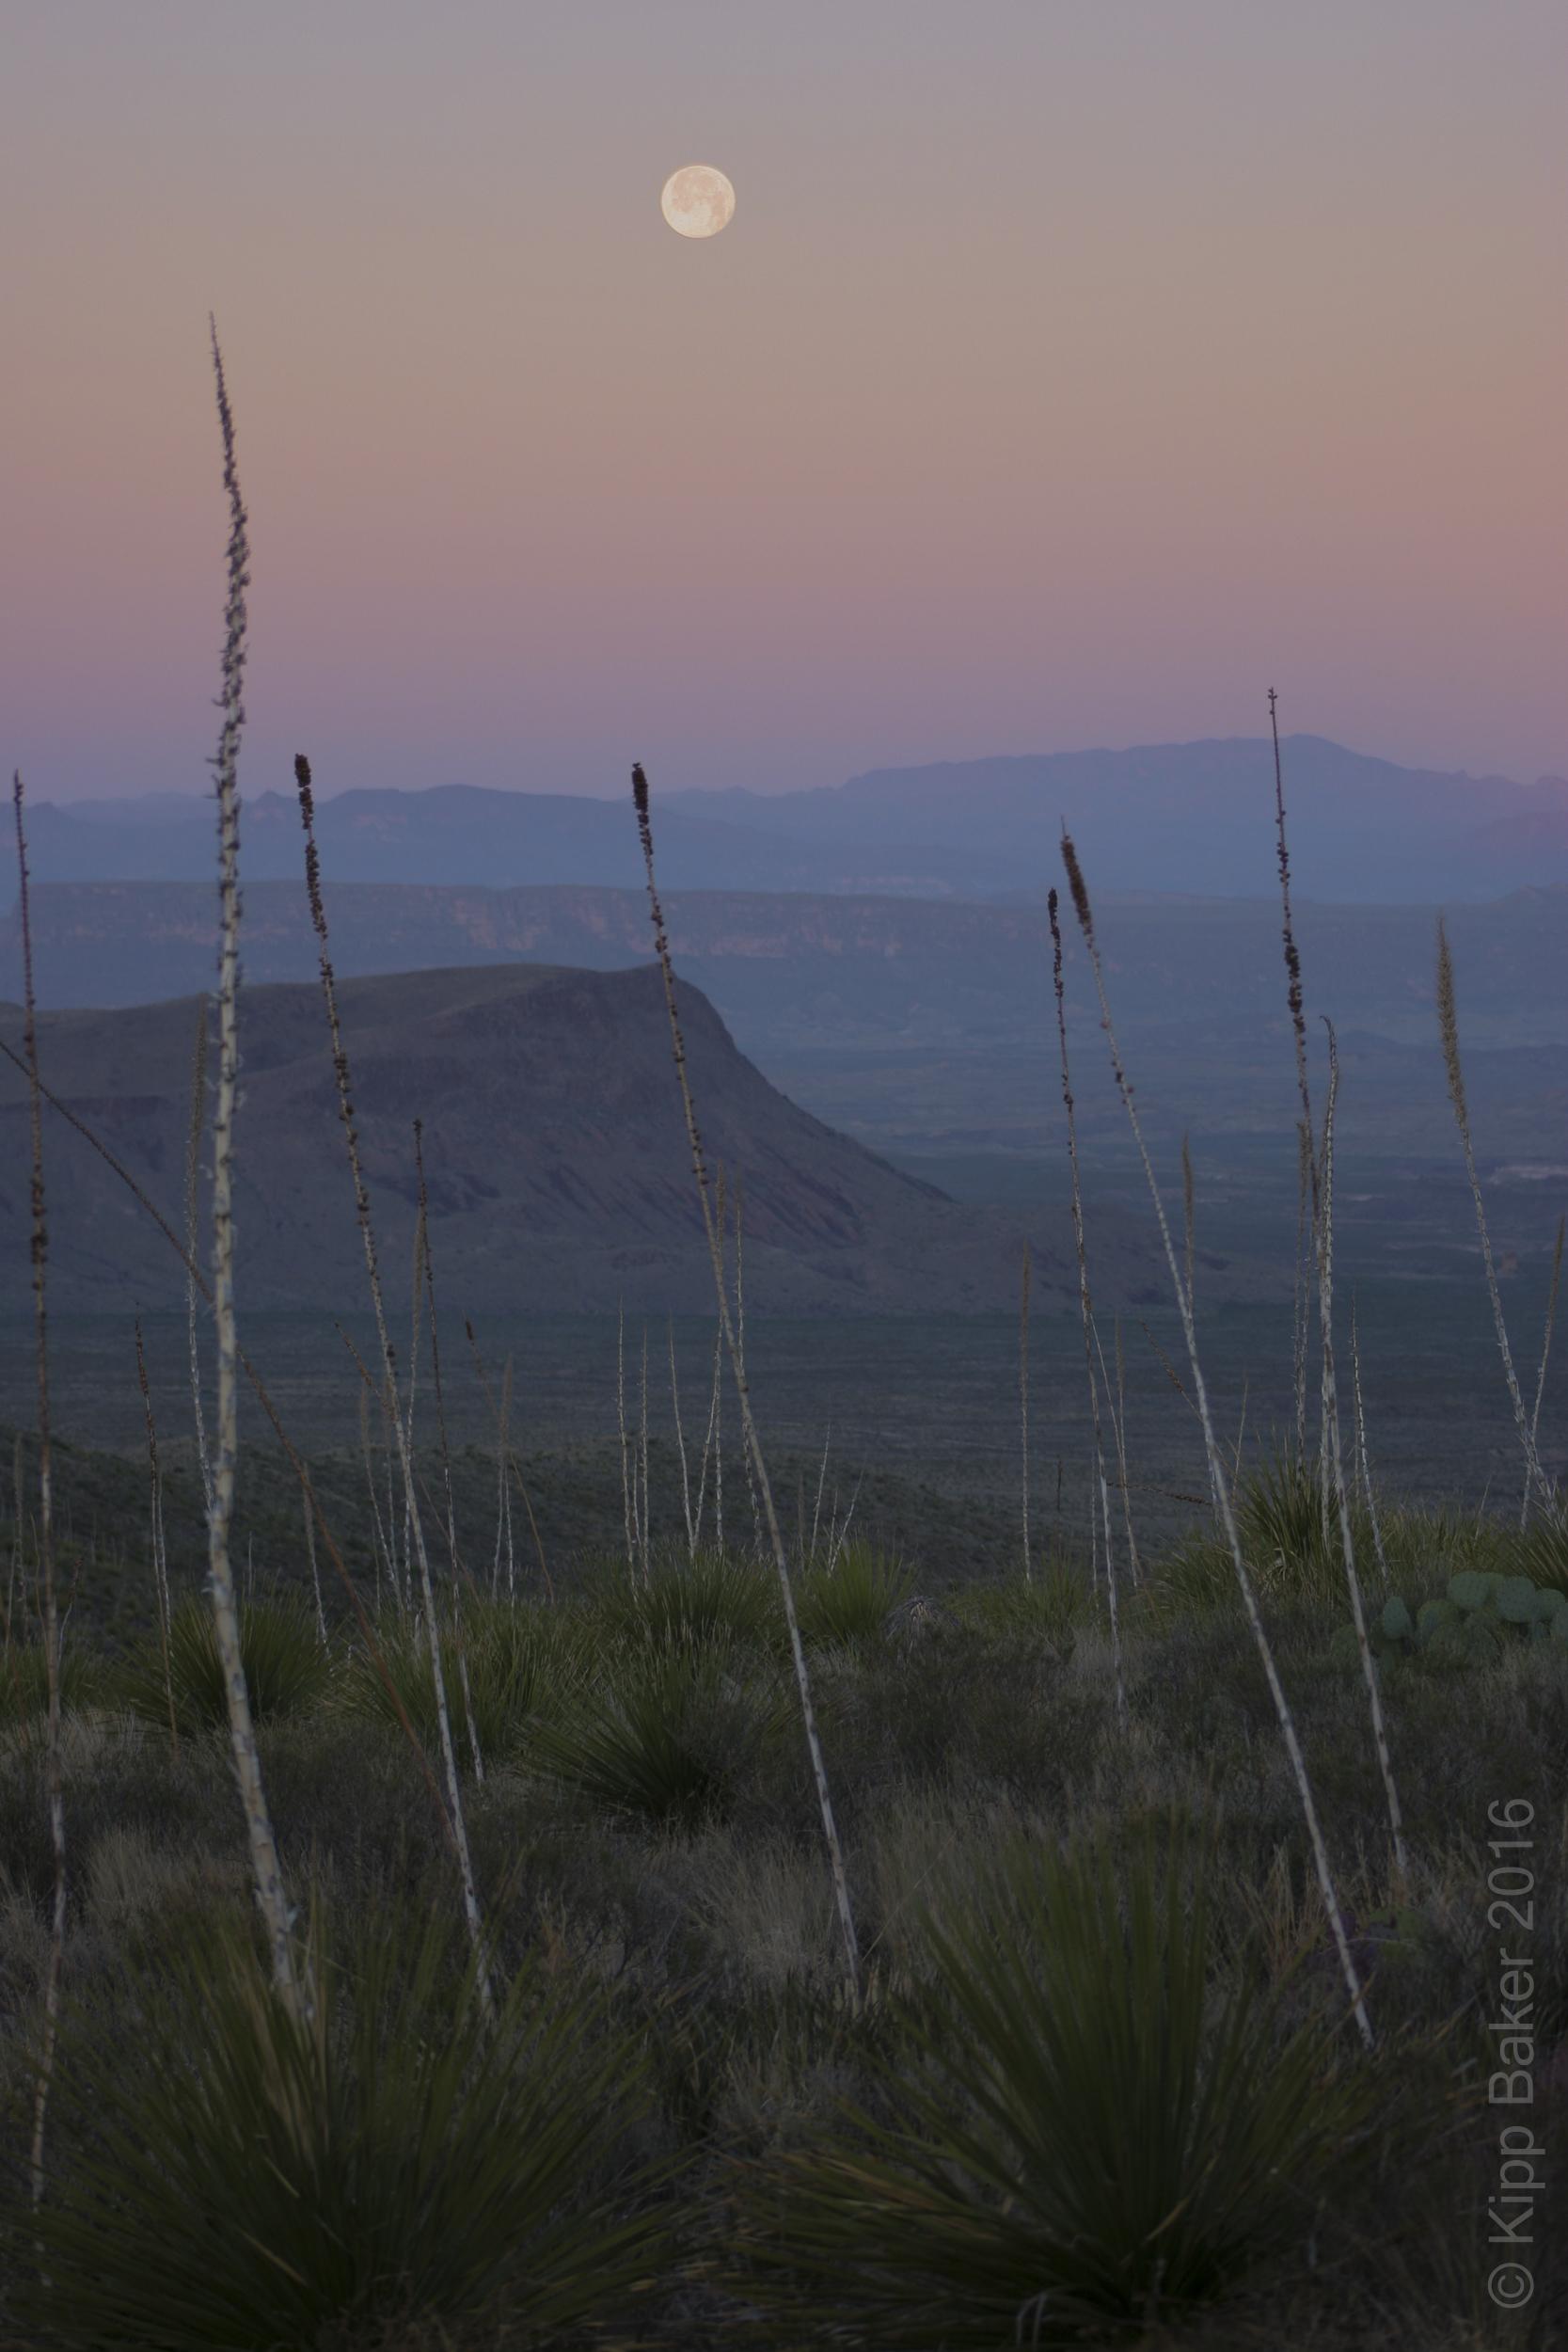 Moonset at dawn, Sotol Vista, Big Bend National Park Copyright © Kipp Baker, All rights reserved.